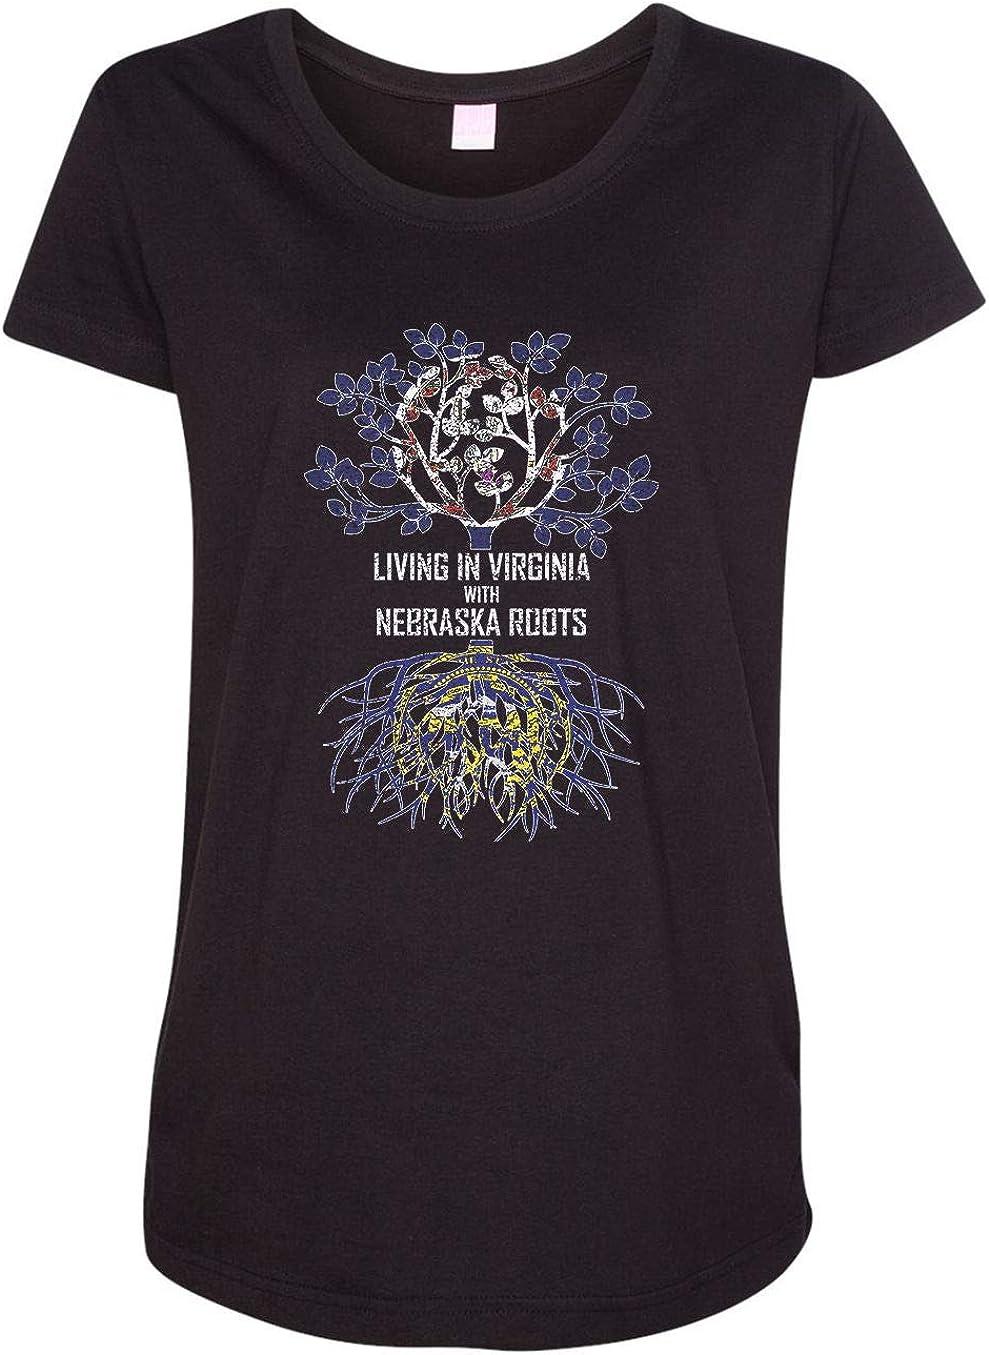 HARD EDGE DESIGN Women's Living in Virginia with Nebraska Roots T-Shirt